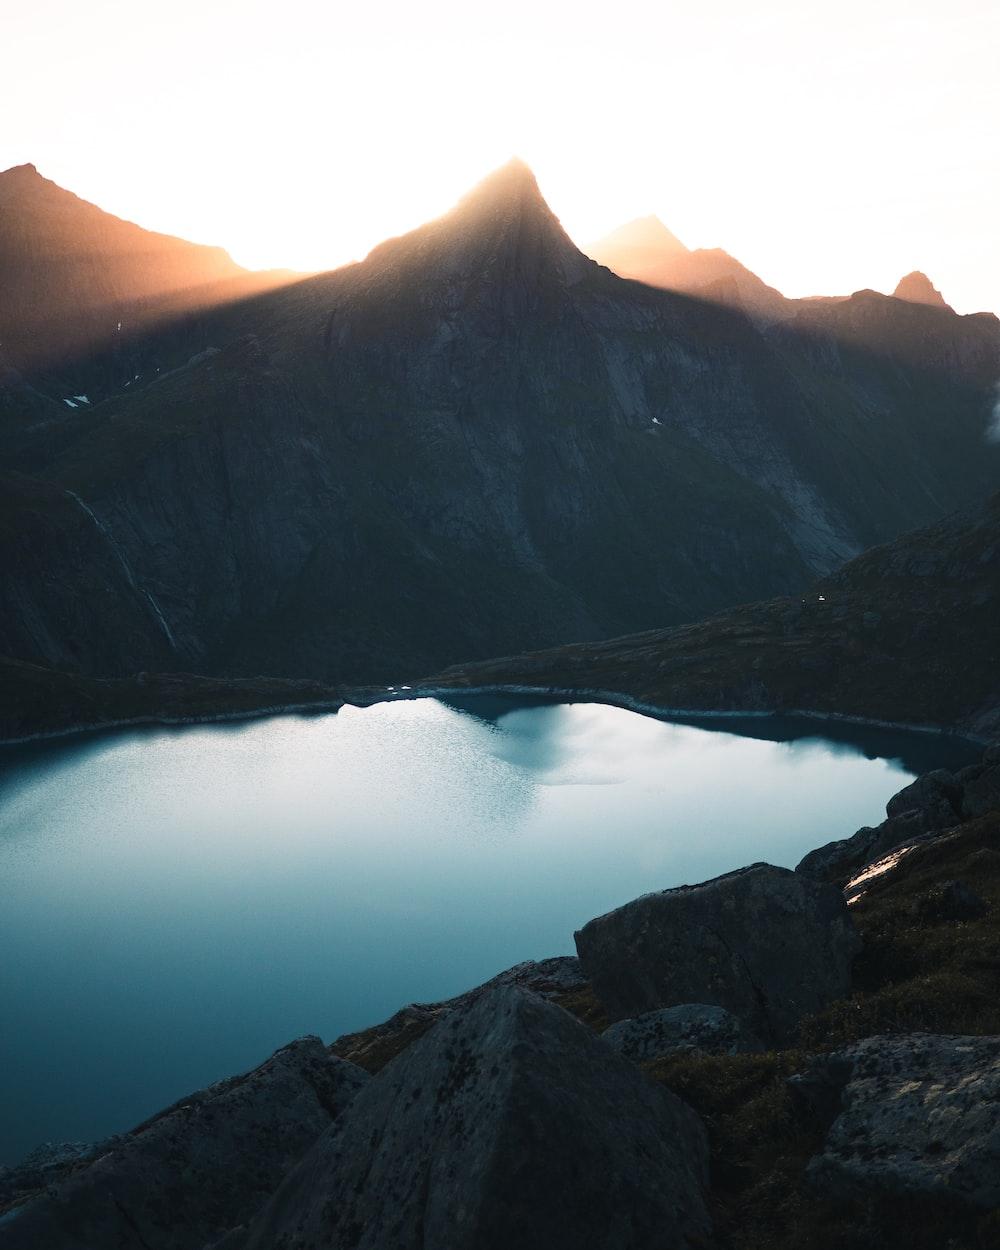 gray mountain near lake